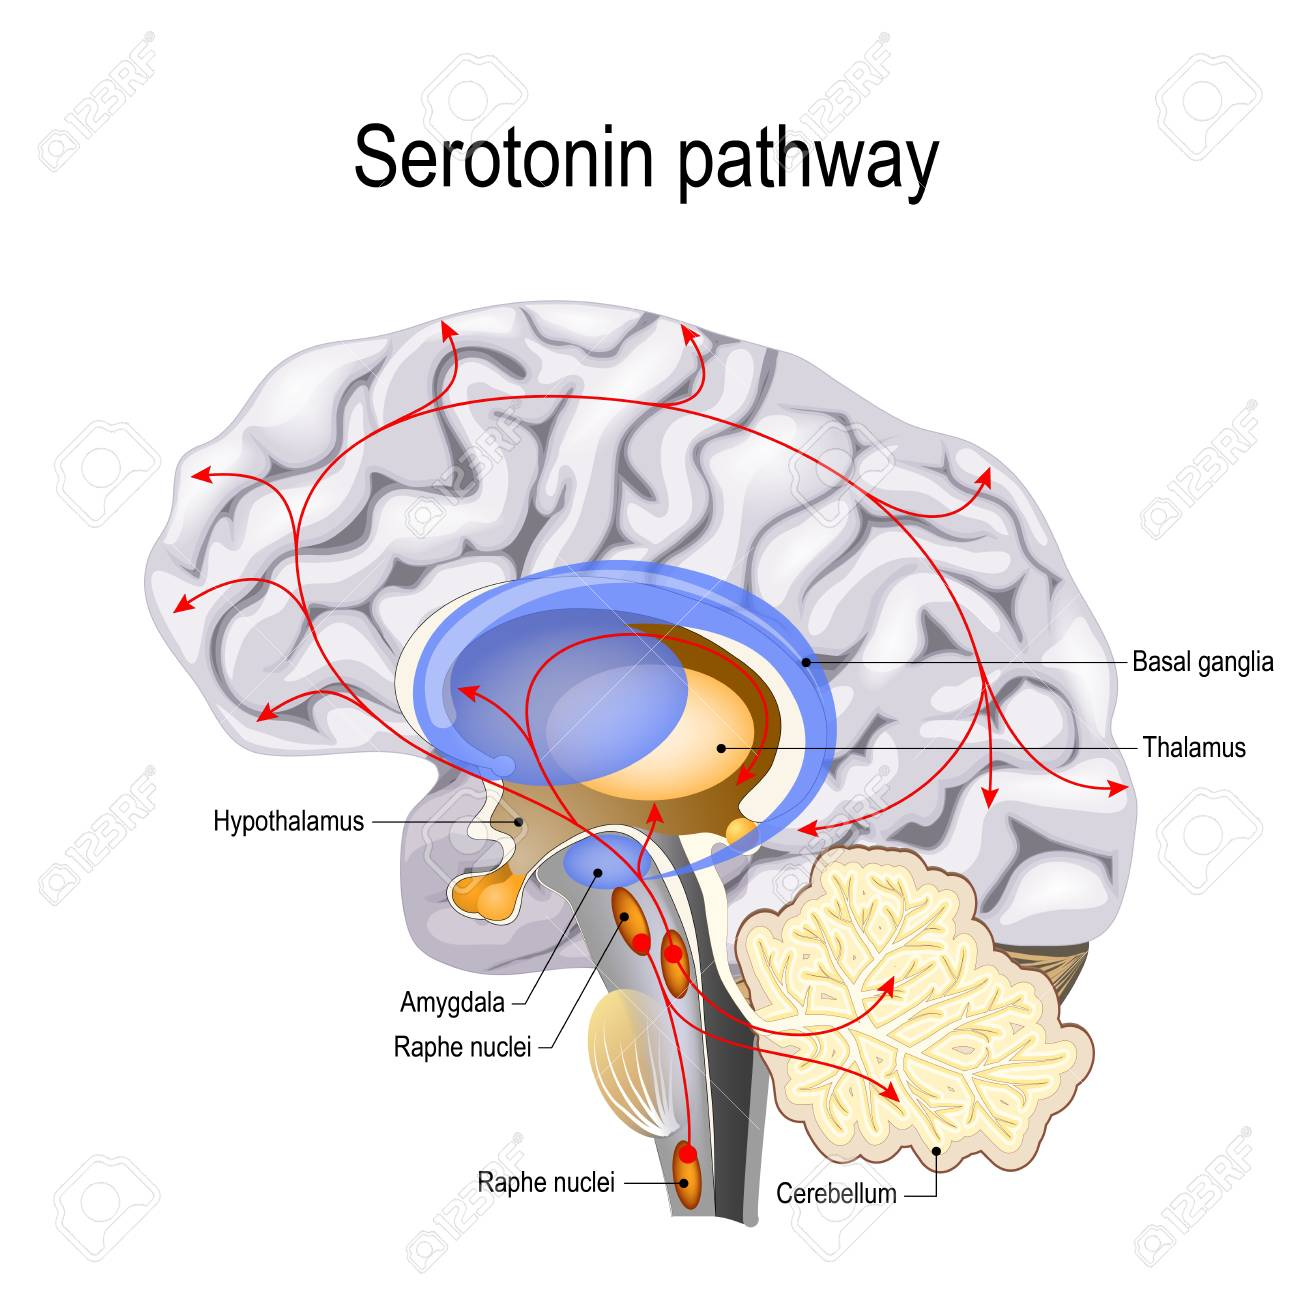 Serotonin pathway. Humans brain with serotonin pathways. psychiatric and neurological disorders. - 102772841